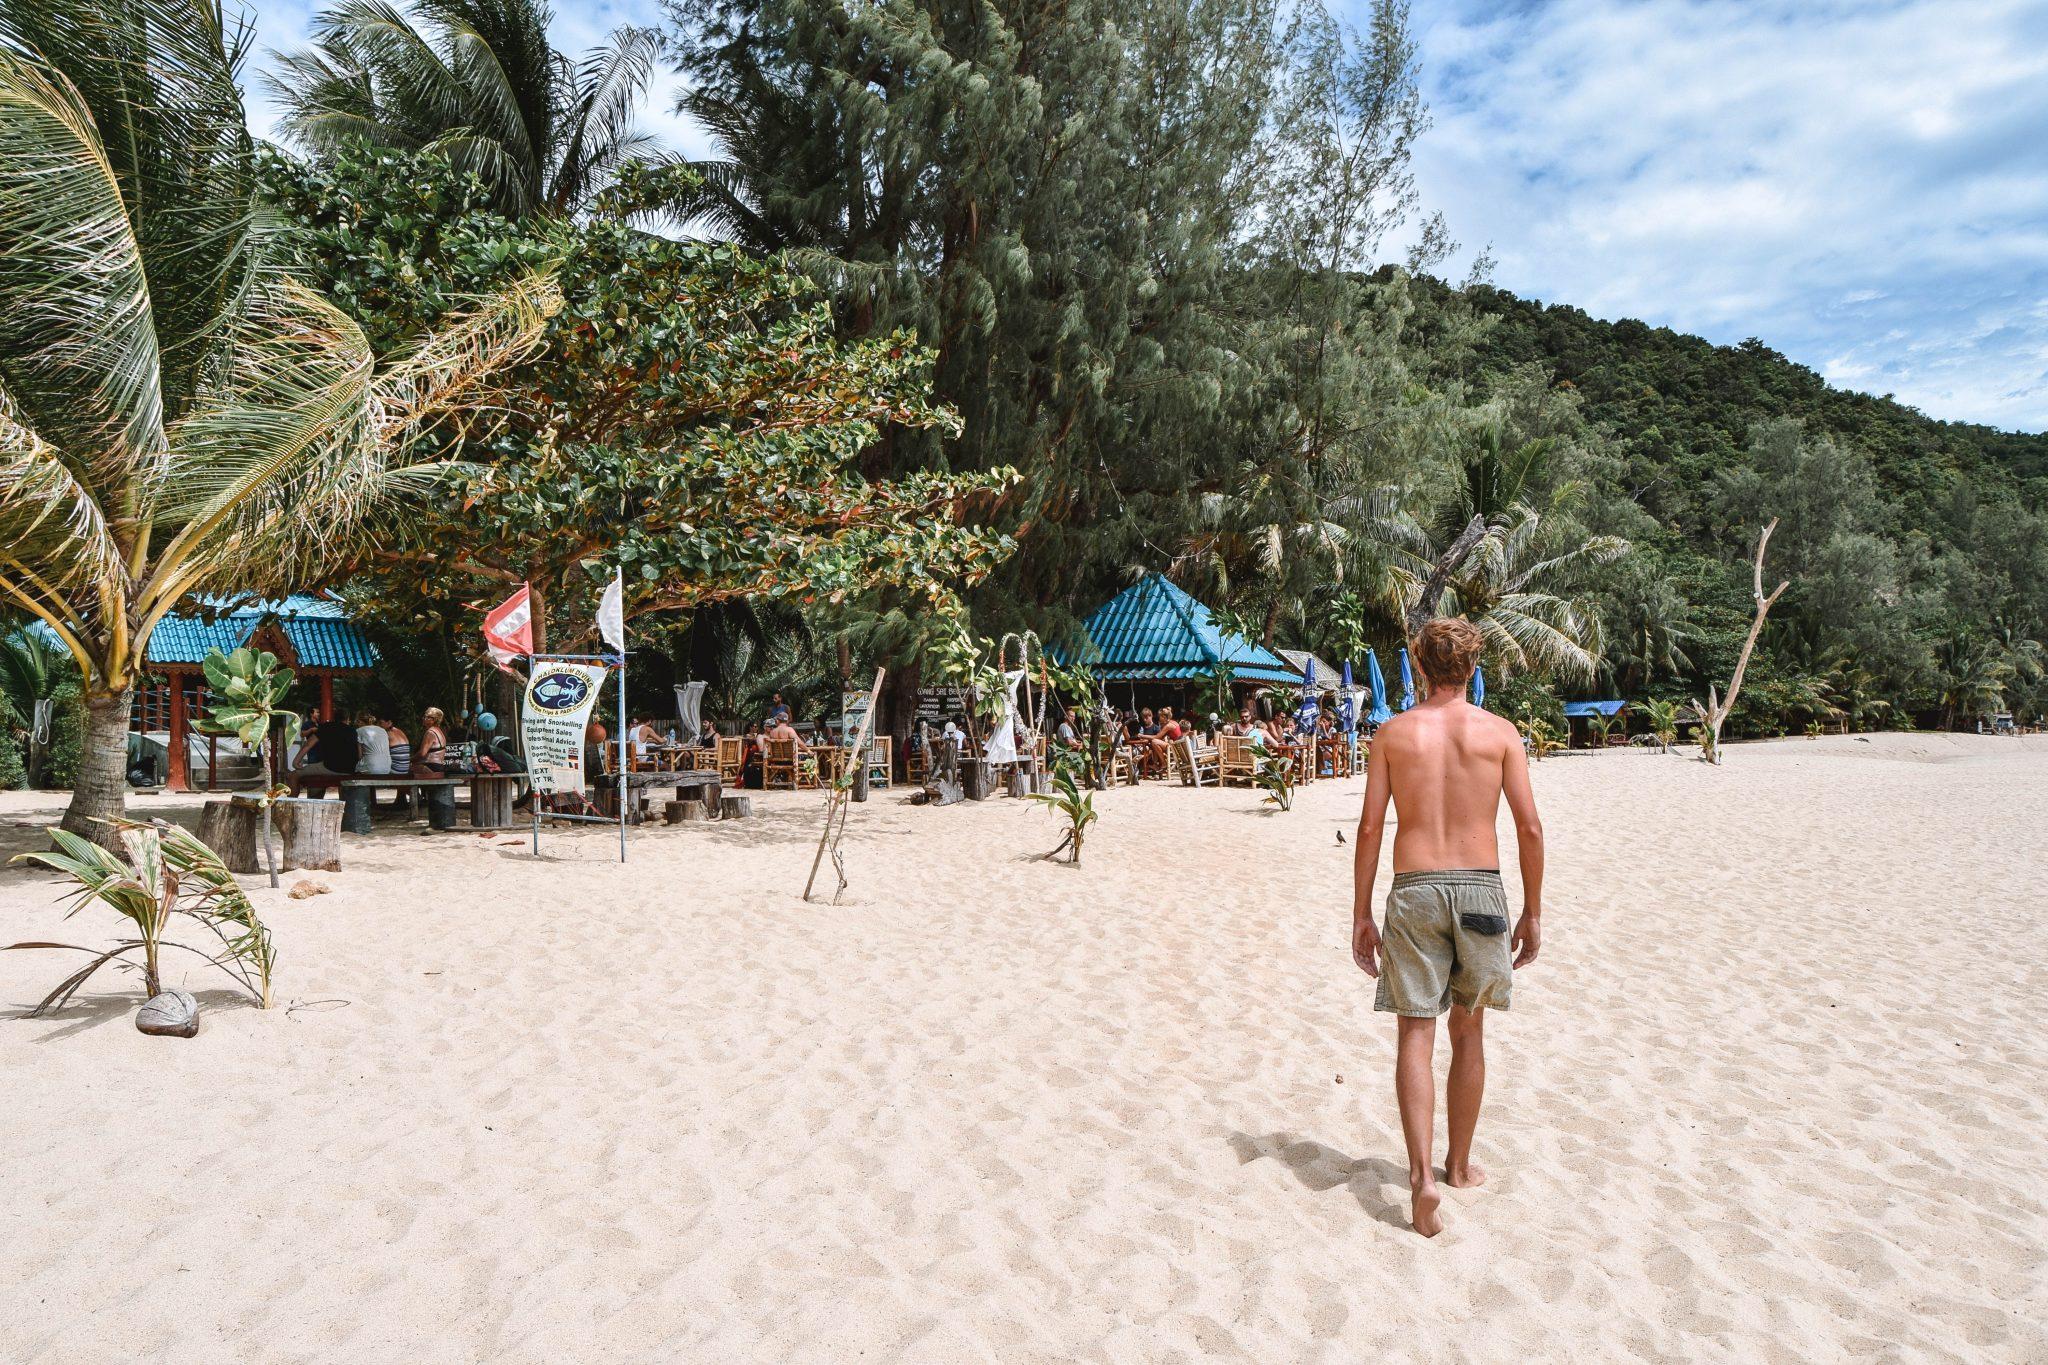 Wanderers & Warriors - Charlie & Lauren UK Travel Couple - Haad Mae Haad Beach Koh Phangan - Koh Ma Koh Phangan Best Beaches Koh Phangan Beaches